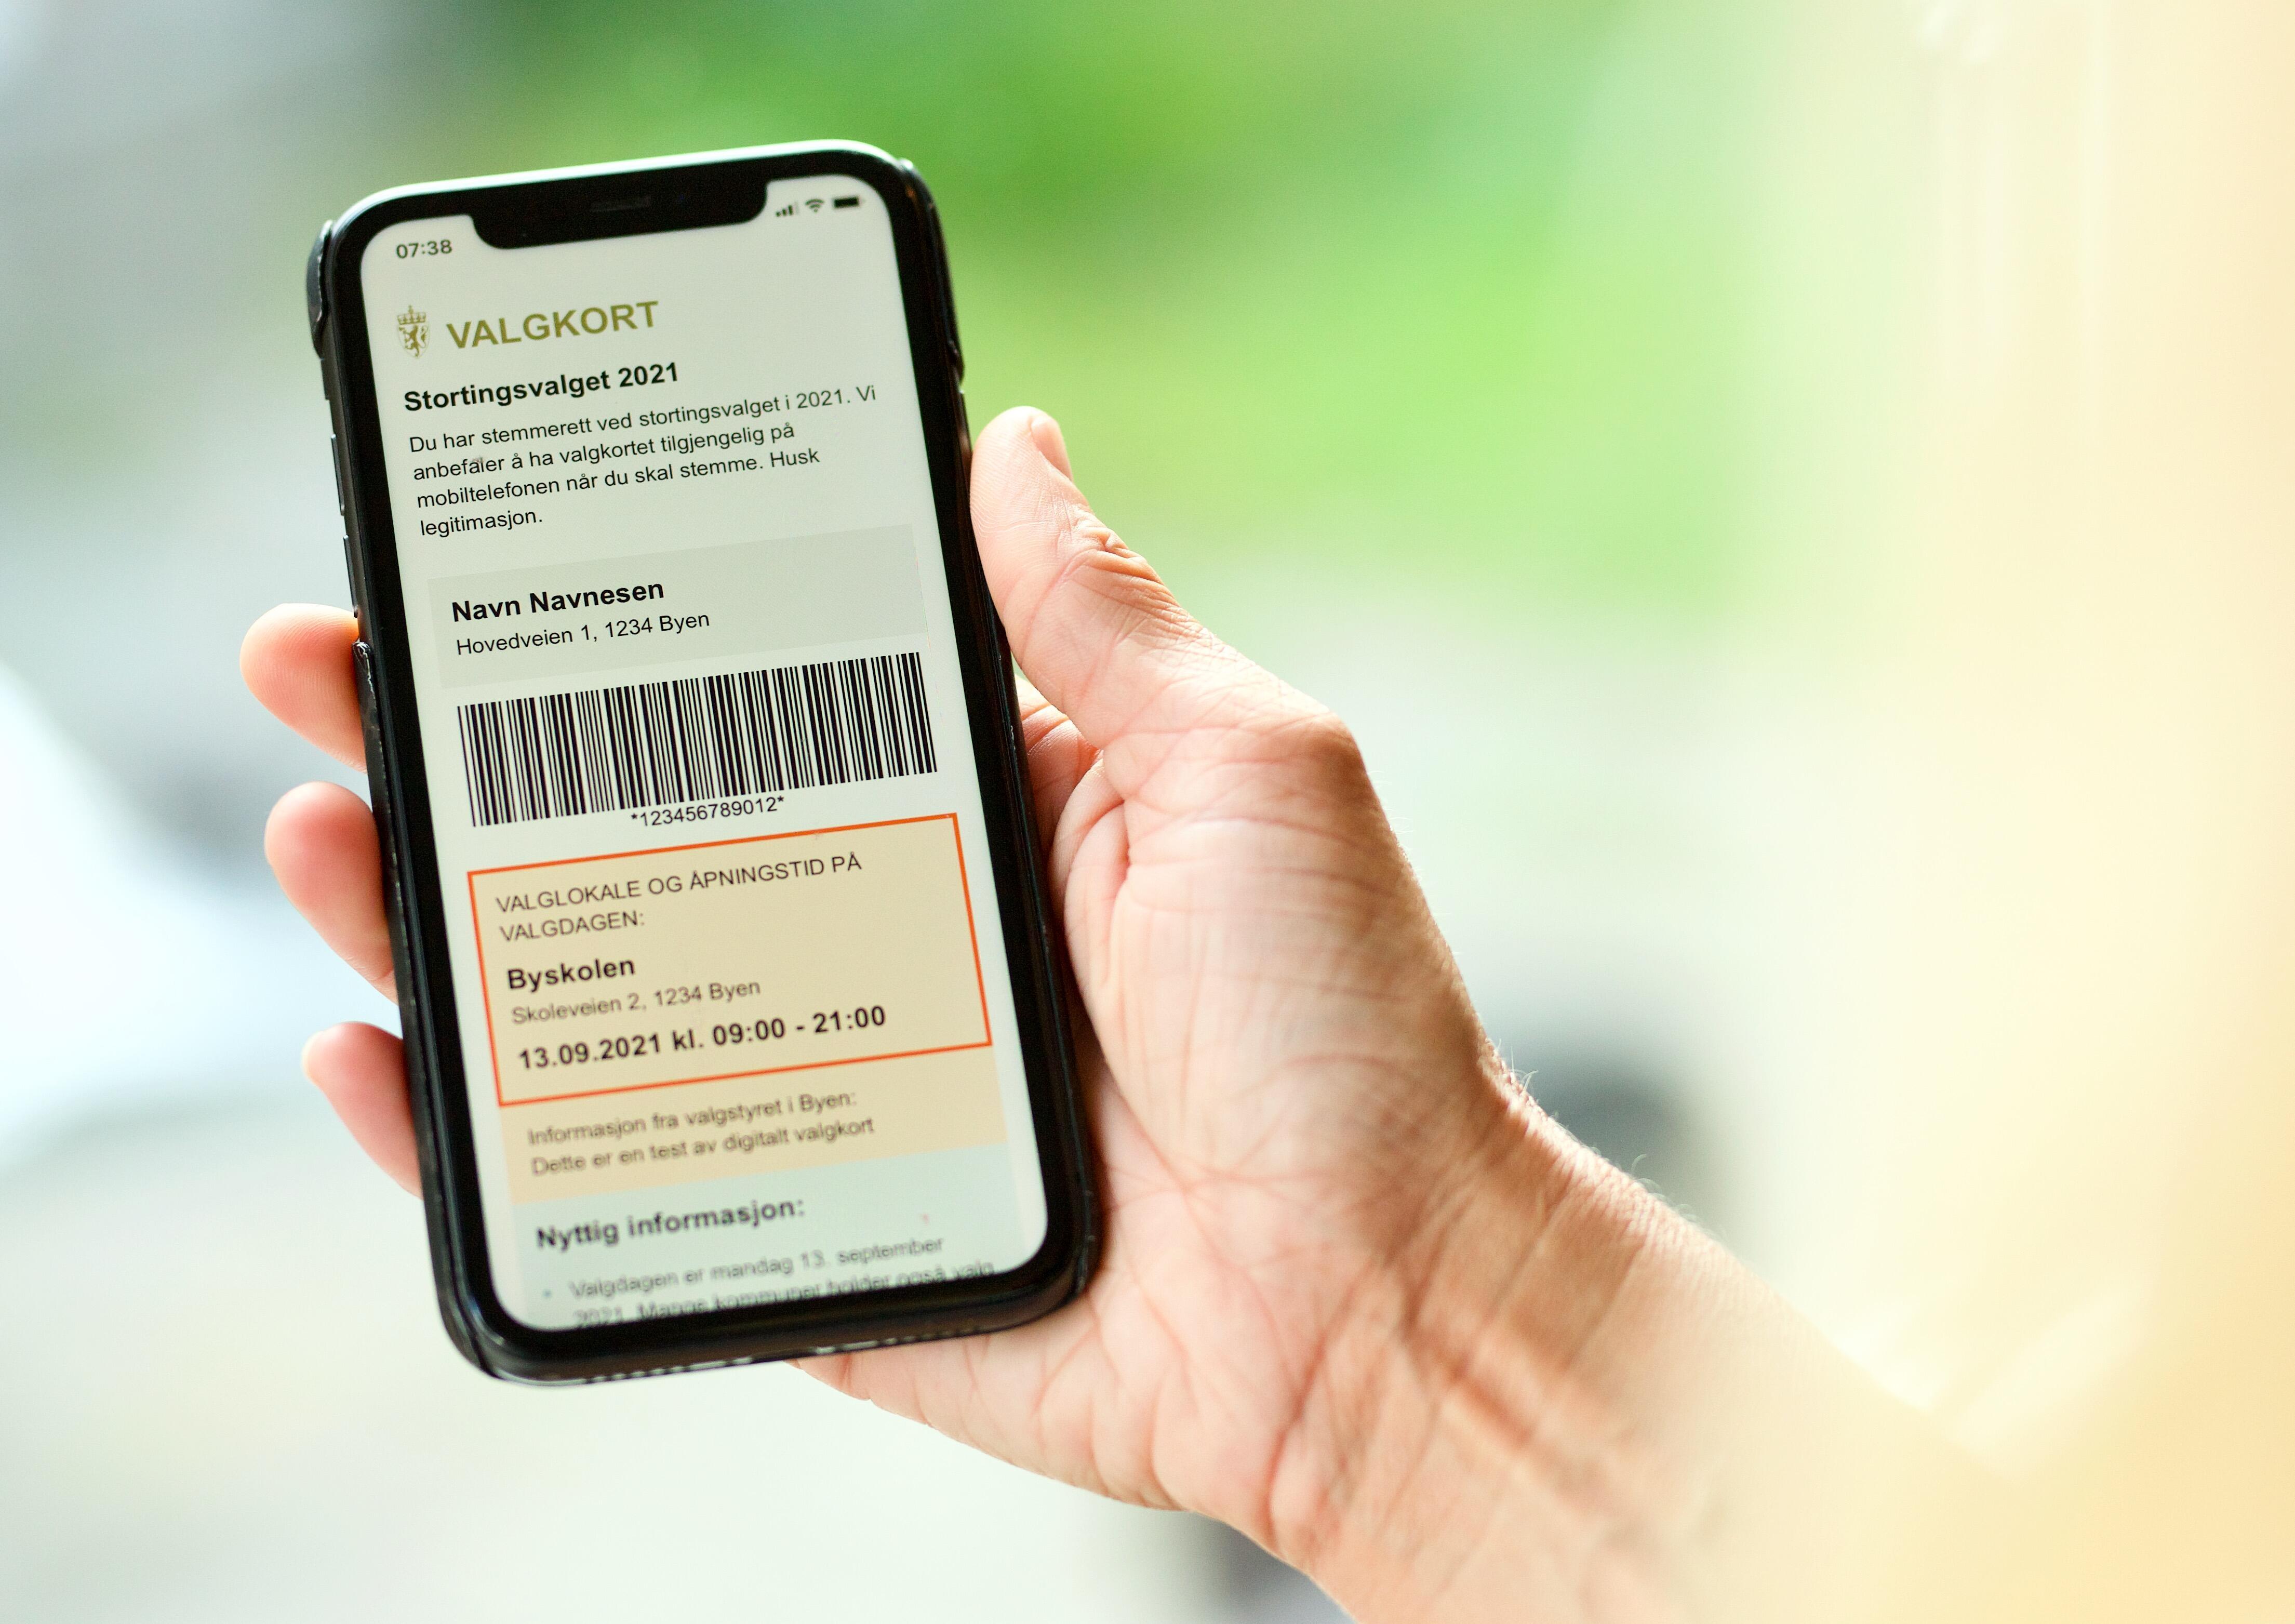 Telefon som viser det digitale valgkortet